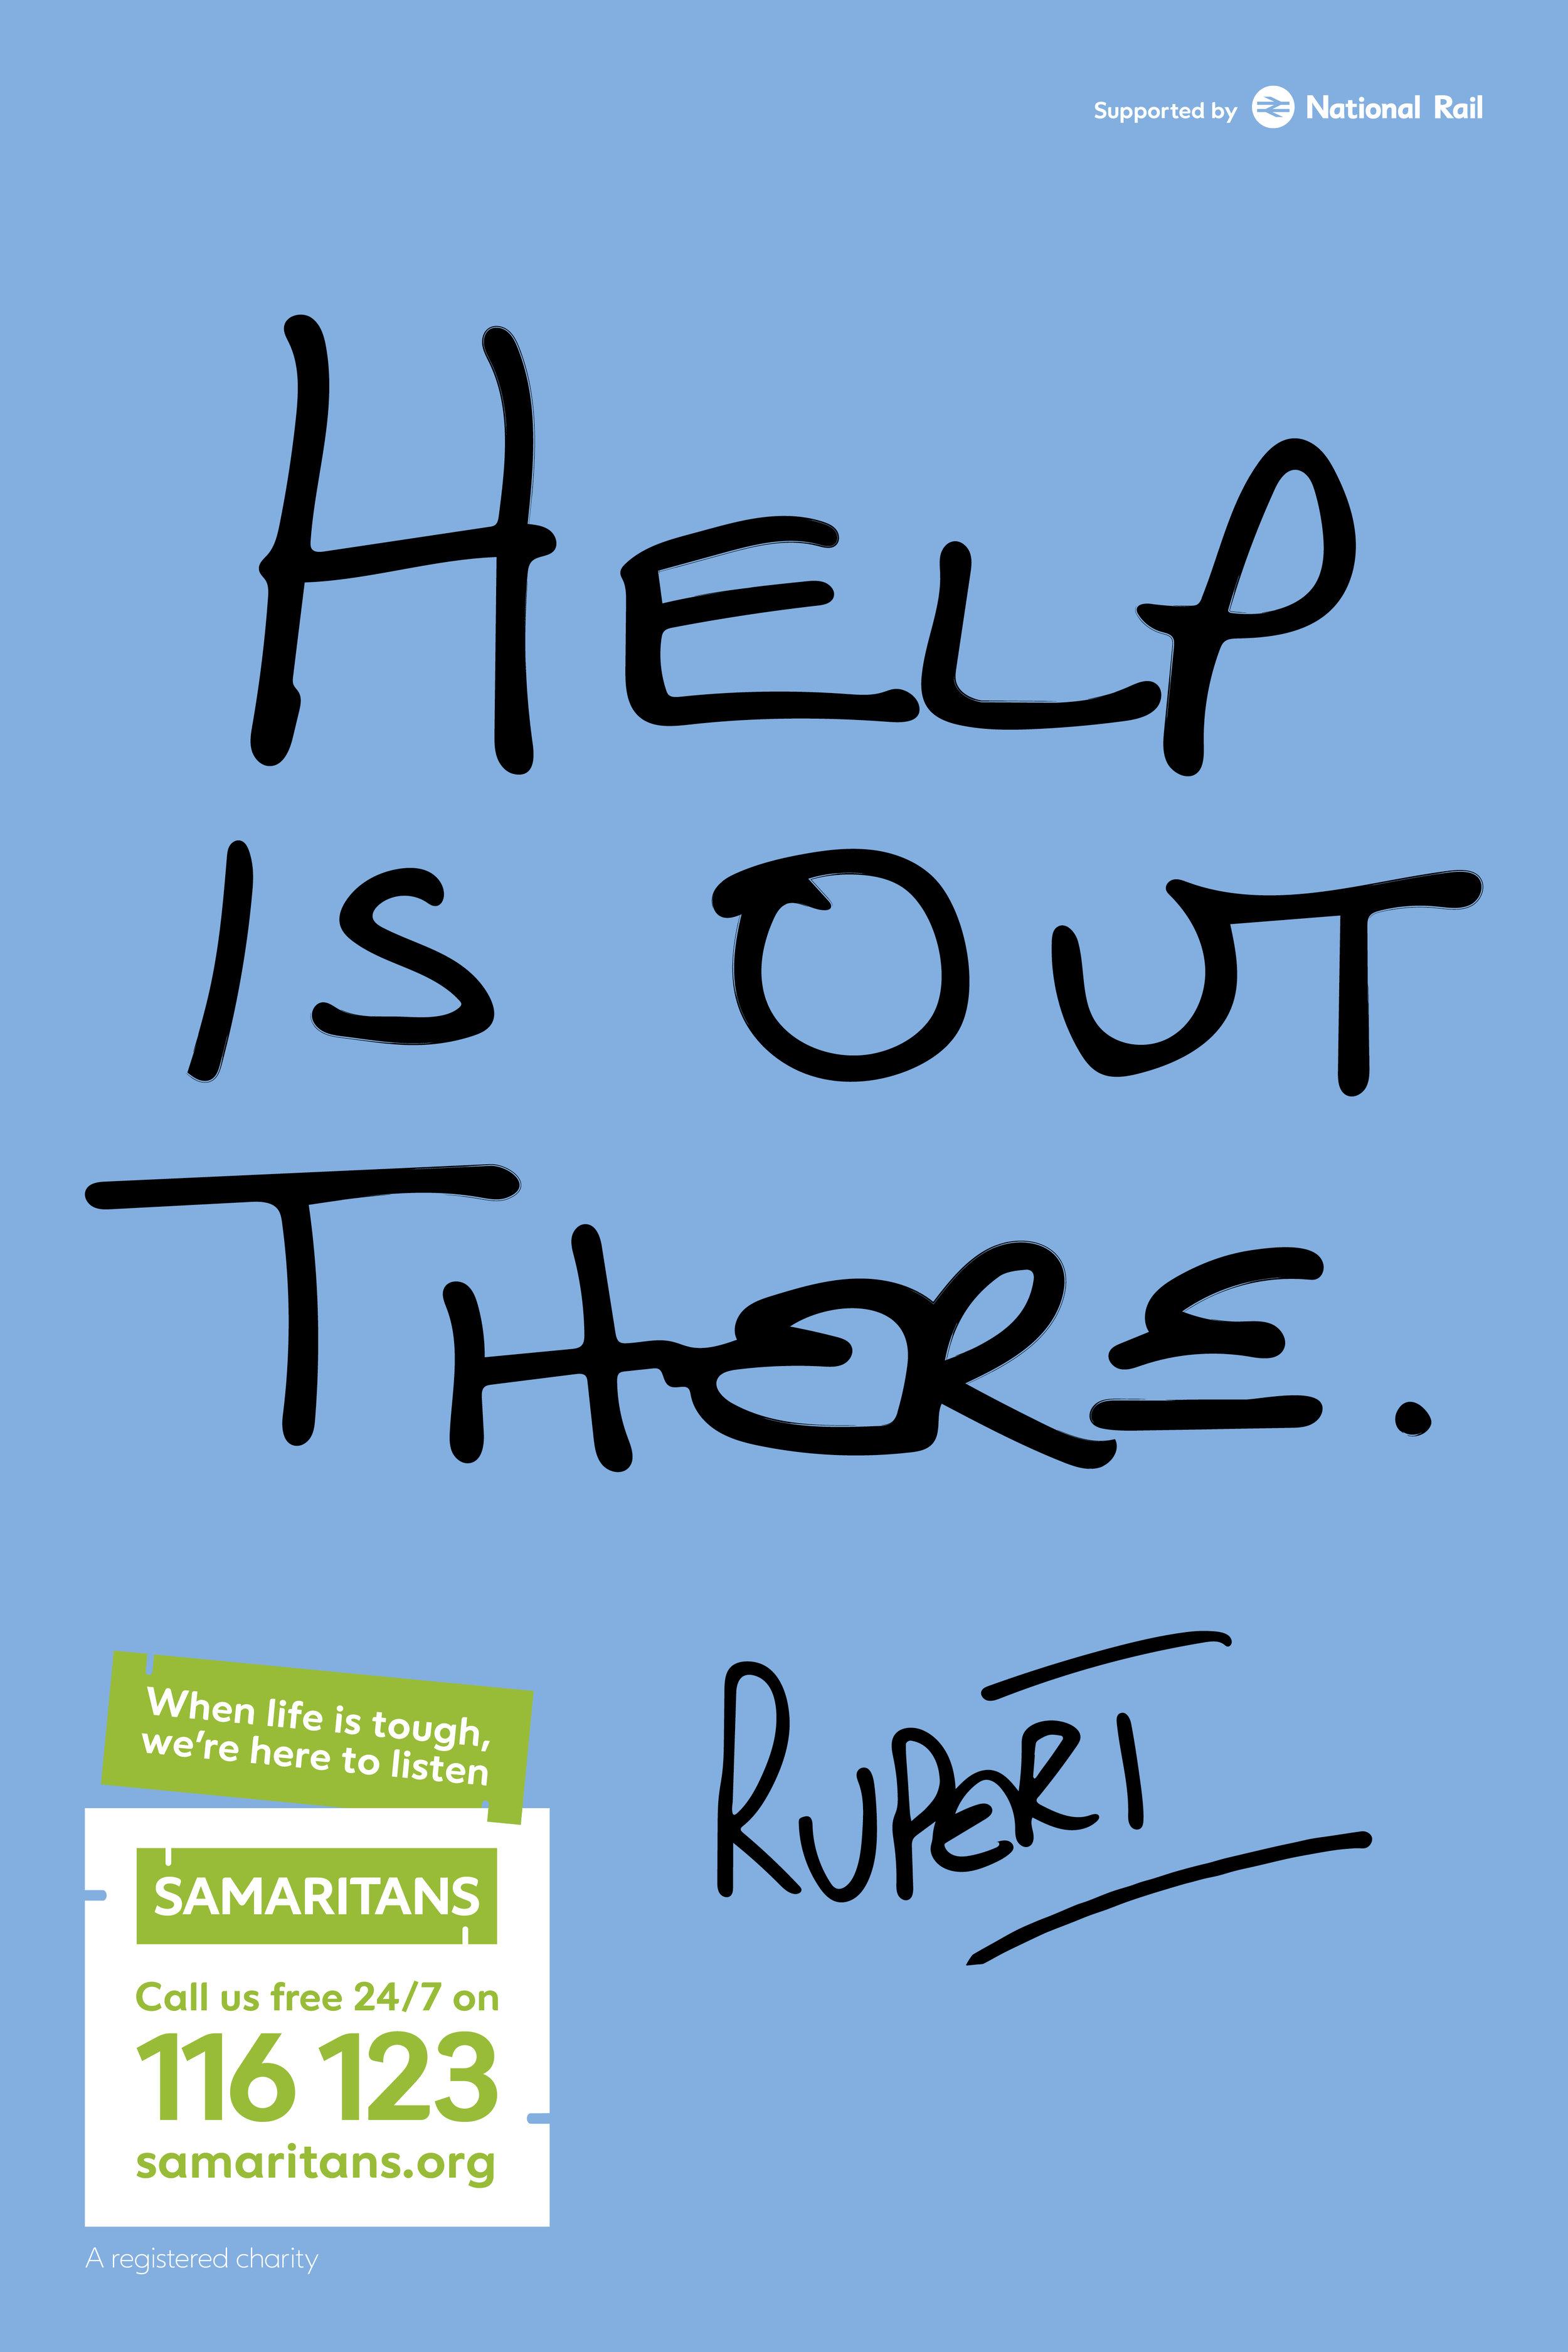 14. SAMARITANS Rupert.jpg